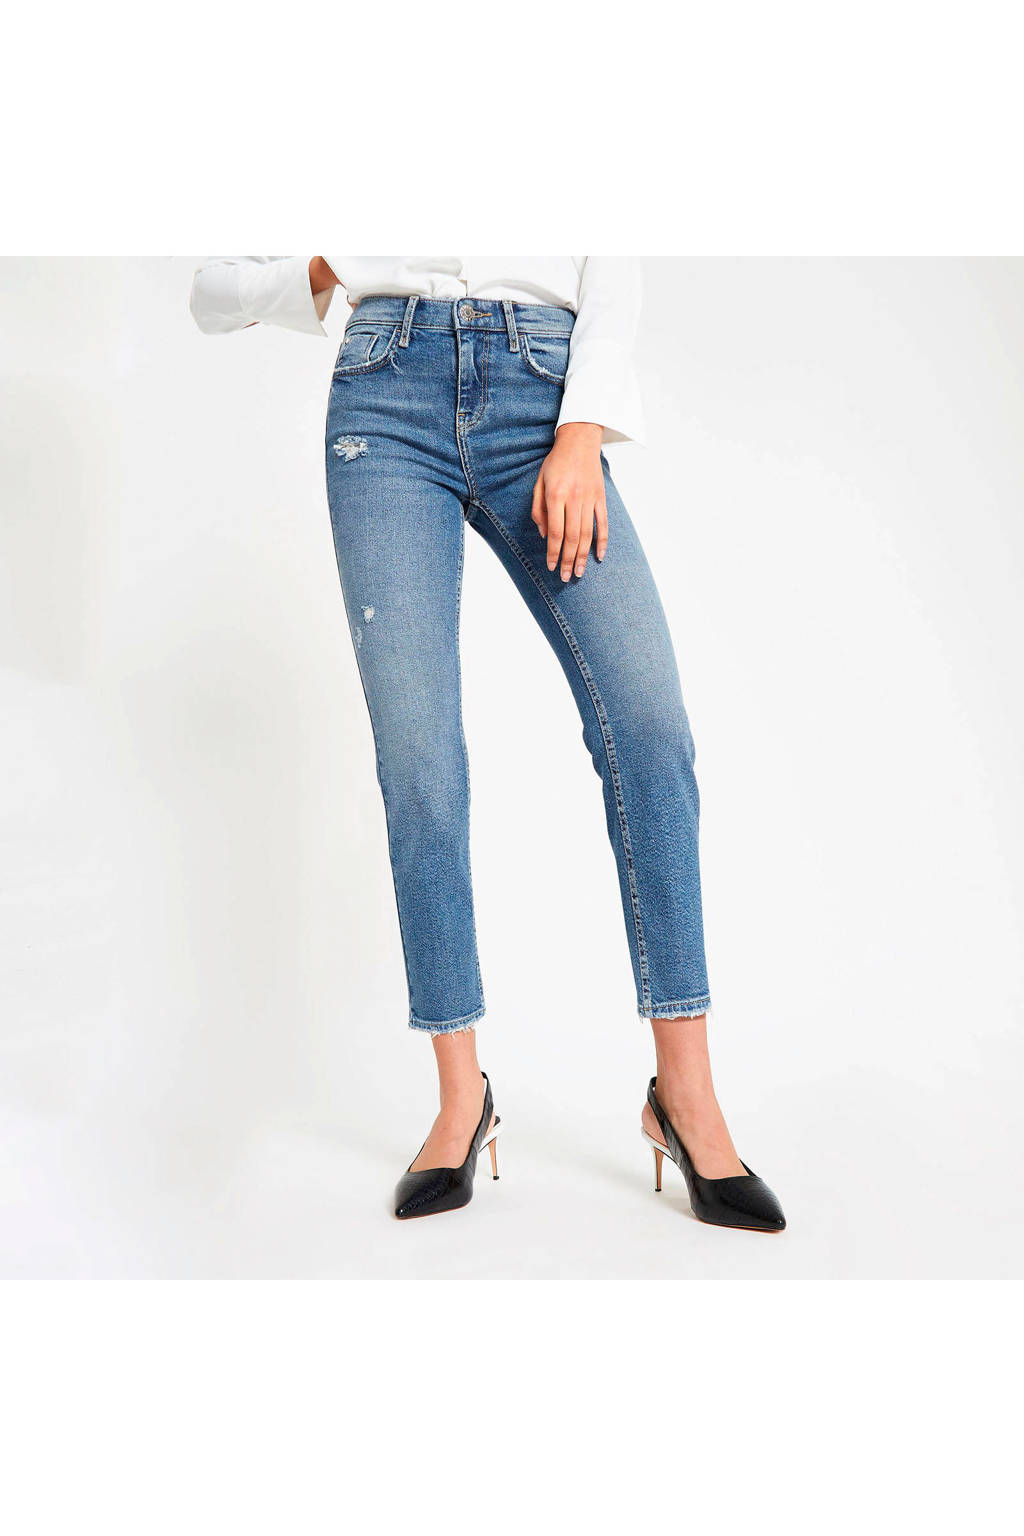 River Island jeans met slijtage details, Lichtblauw